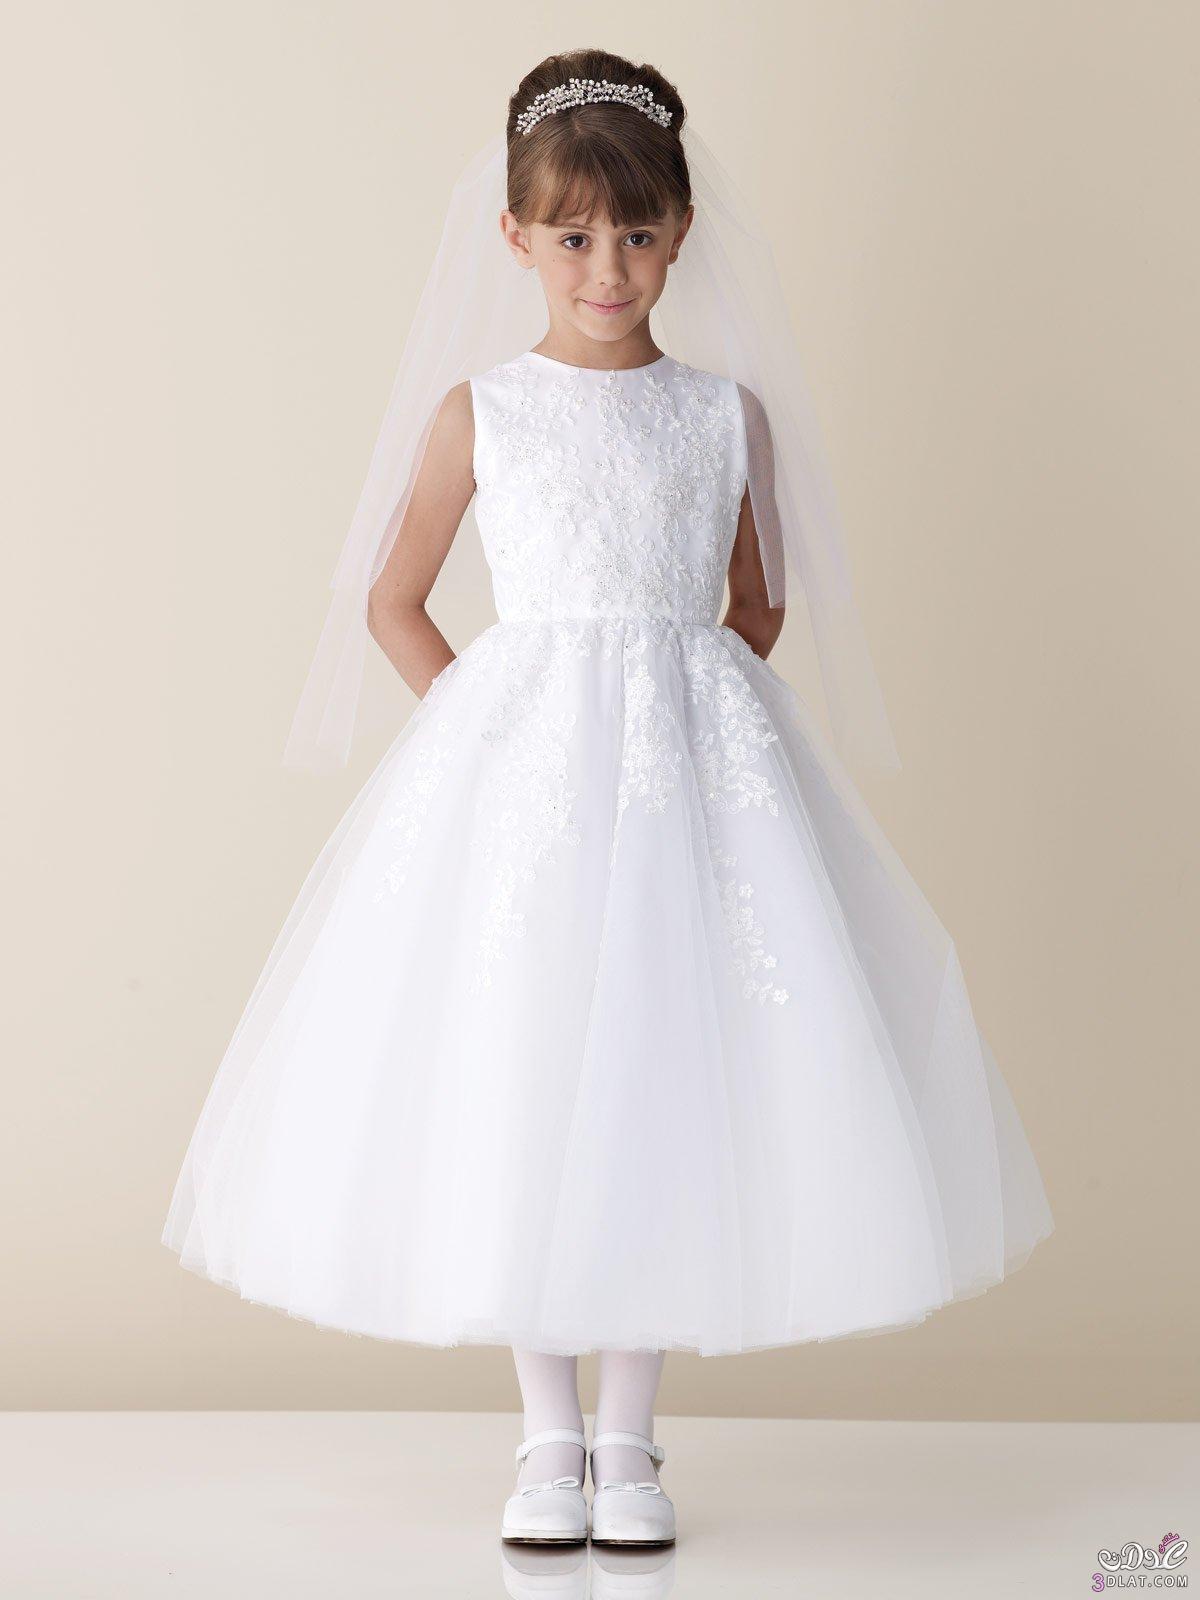 63a07b1bc فساتين زفاف اطفال 2020 , فساتين اطفال باللون الابيض - نم نم